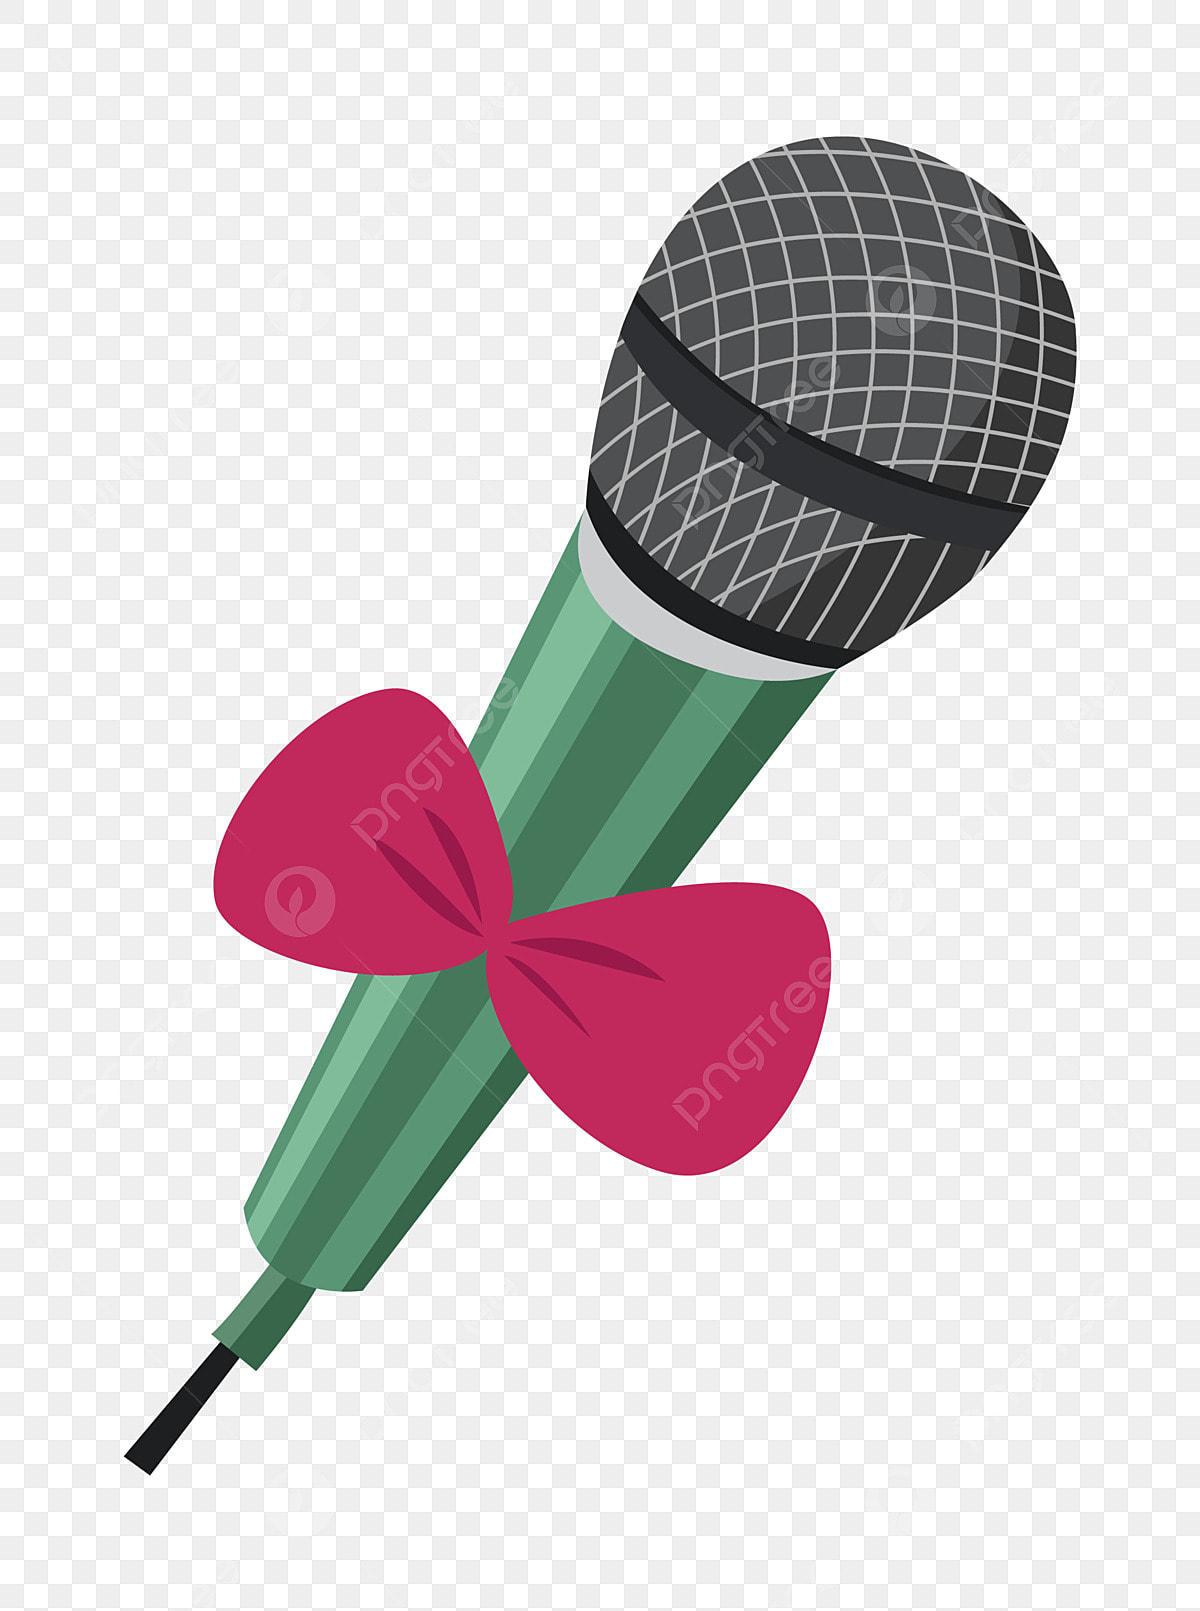 Micrófono Verde Lazo Rojo Hermoso Micrófono Ilustración De